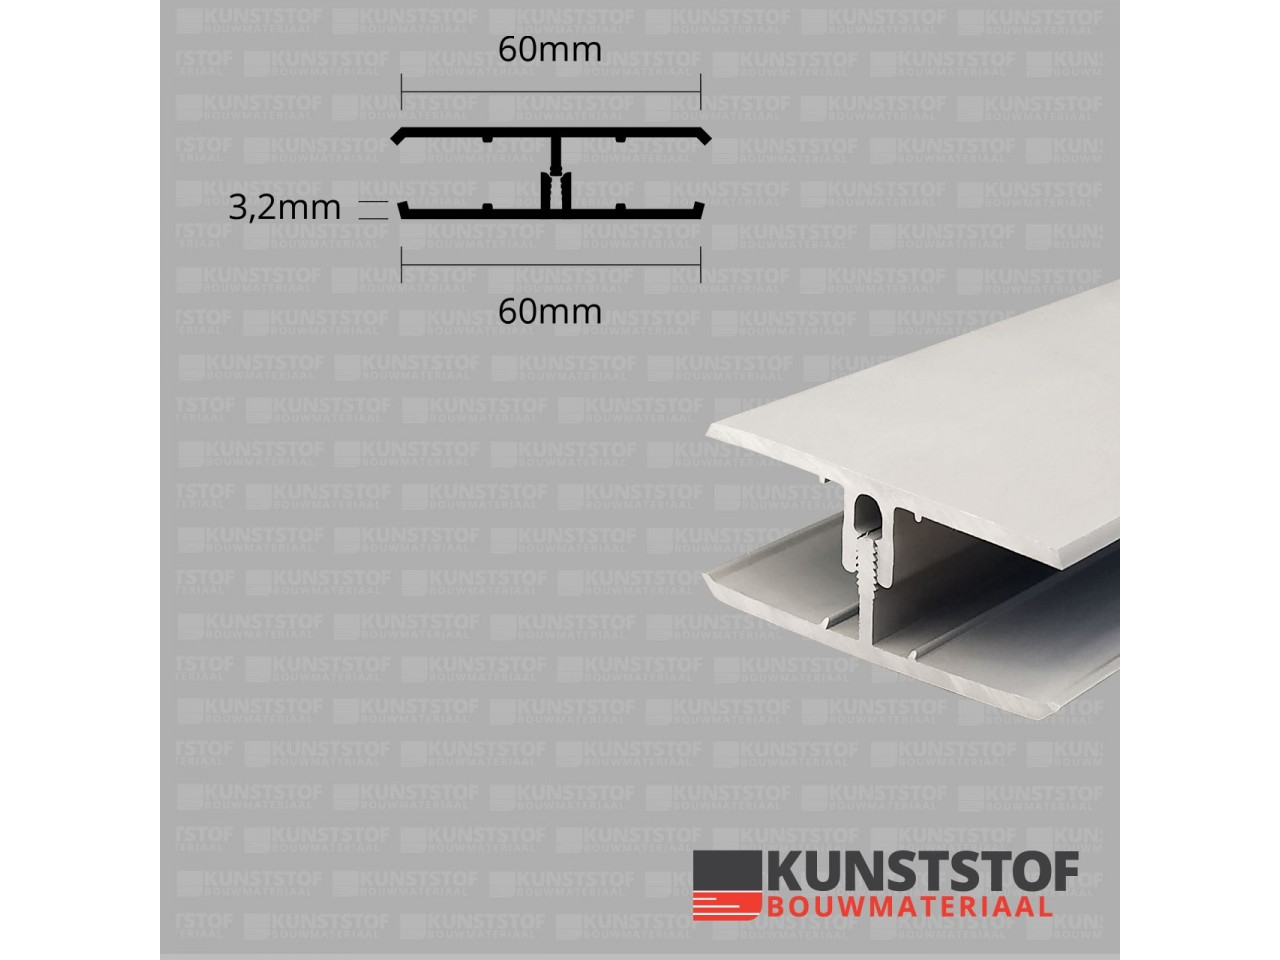 Eurotexx Dubbel Rabat - potdeksel 50mm verbindingsprofiel 2 delig kunststof gevelbekleding profiel in de kleur creme ral 9001